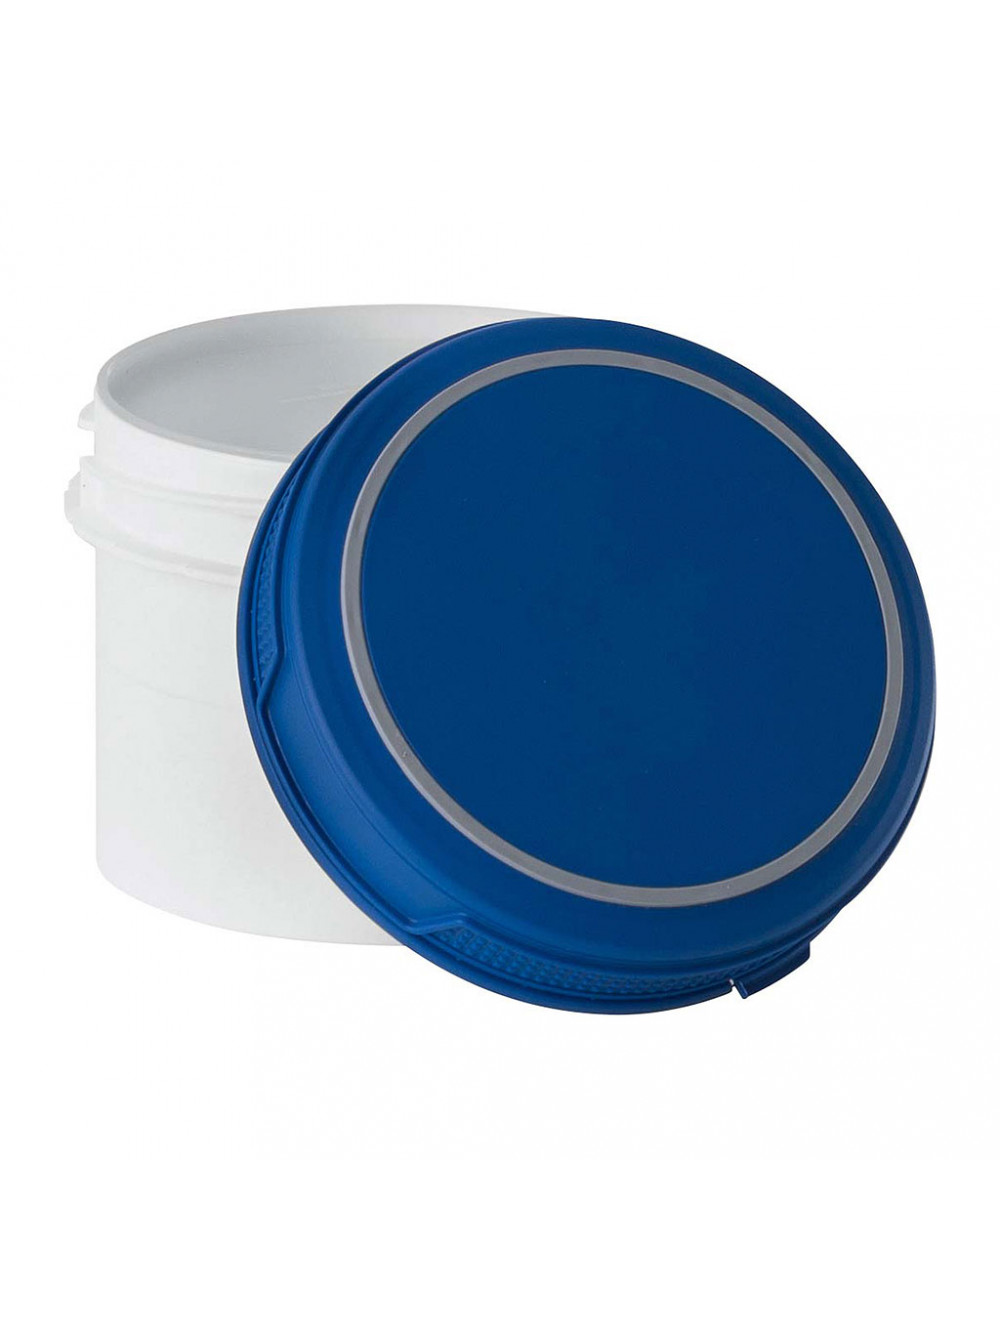 Das Produkt Reitel Kunststoff-Becher 20500055 aus dem Global-dent online shop.